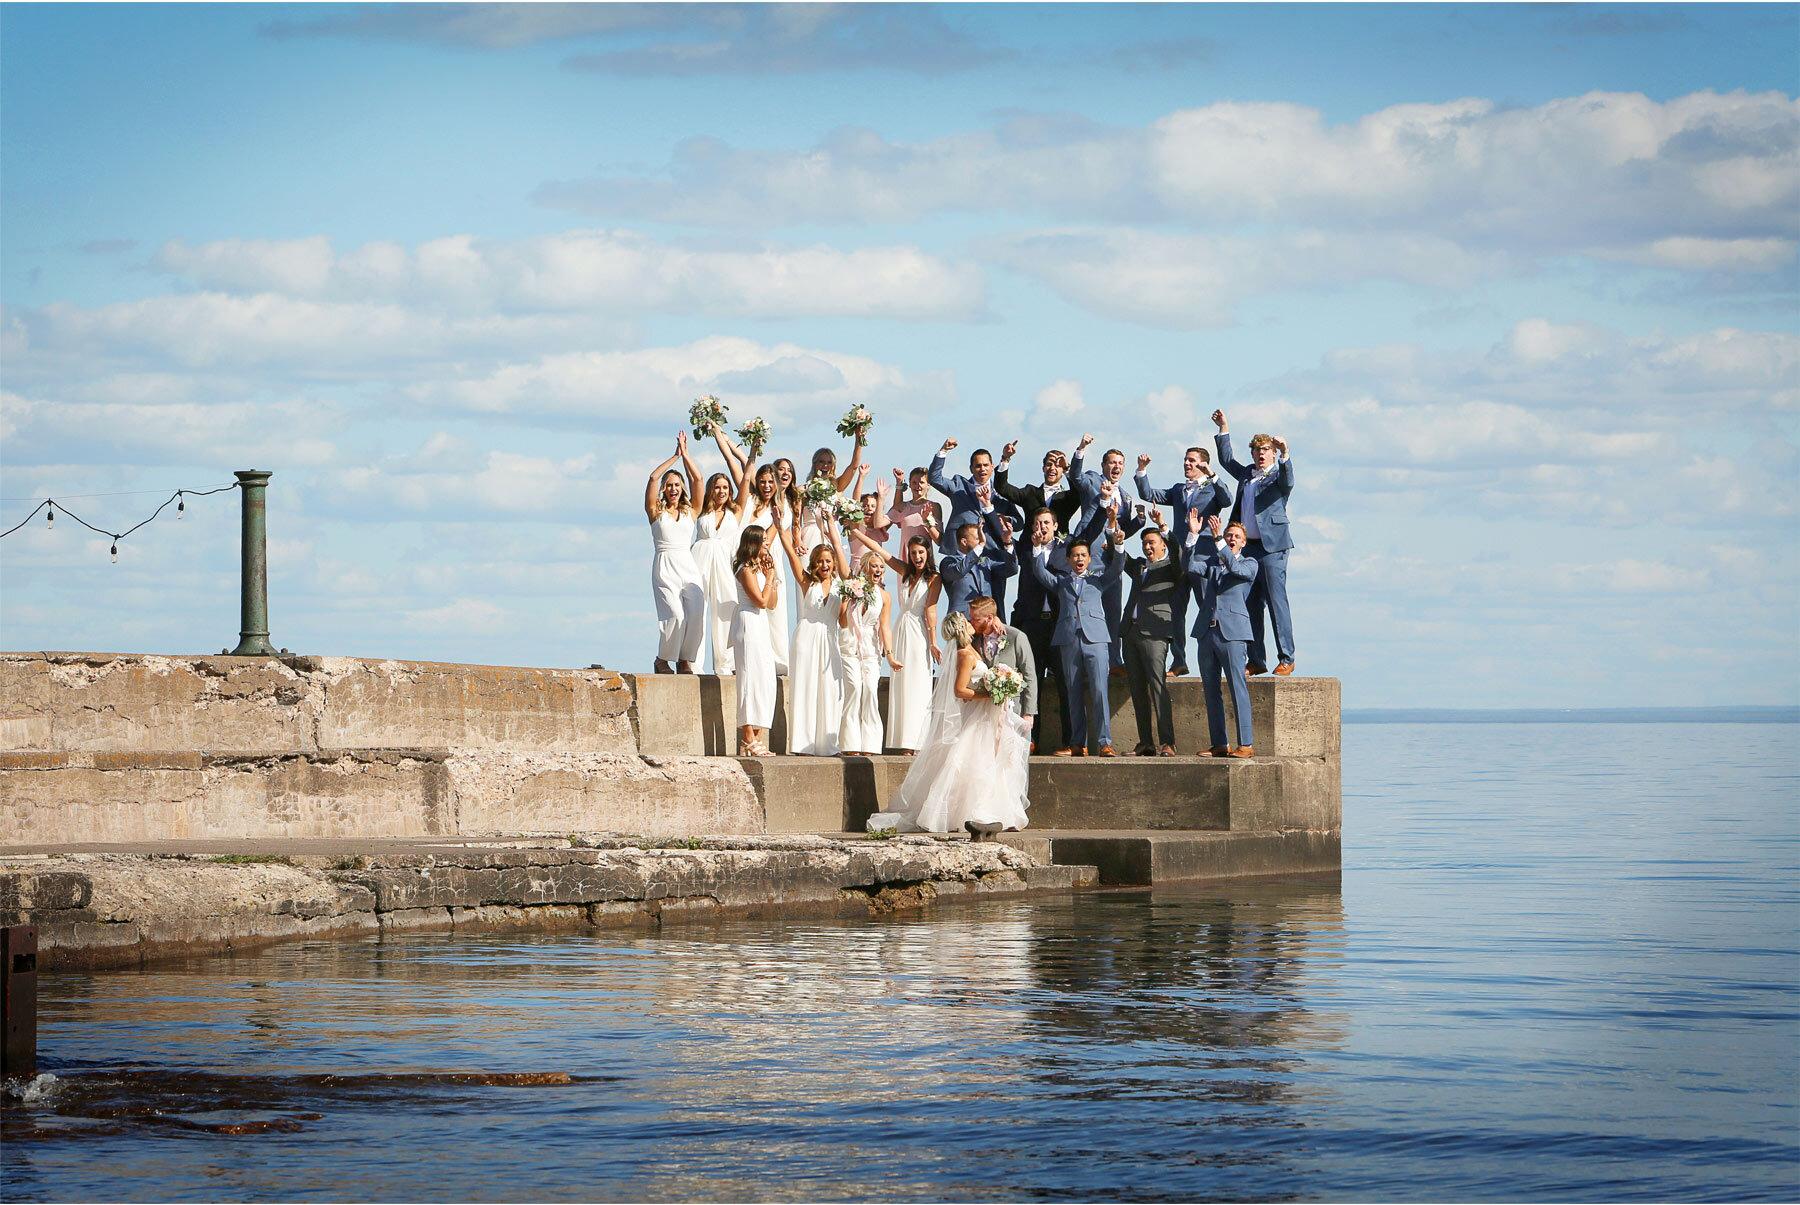 11-Vick-Photography-Wedding-Duluth-Minnesota-Glensheen-Mansion-Groom-Bride-Bridesmaids-Groomsmen-Lake-Superior-Kiss-Catherine-and-John.jpg